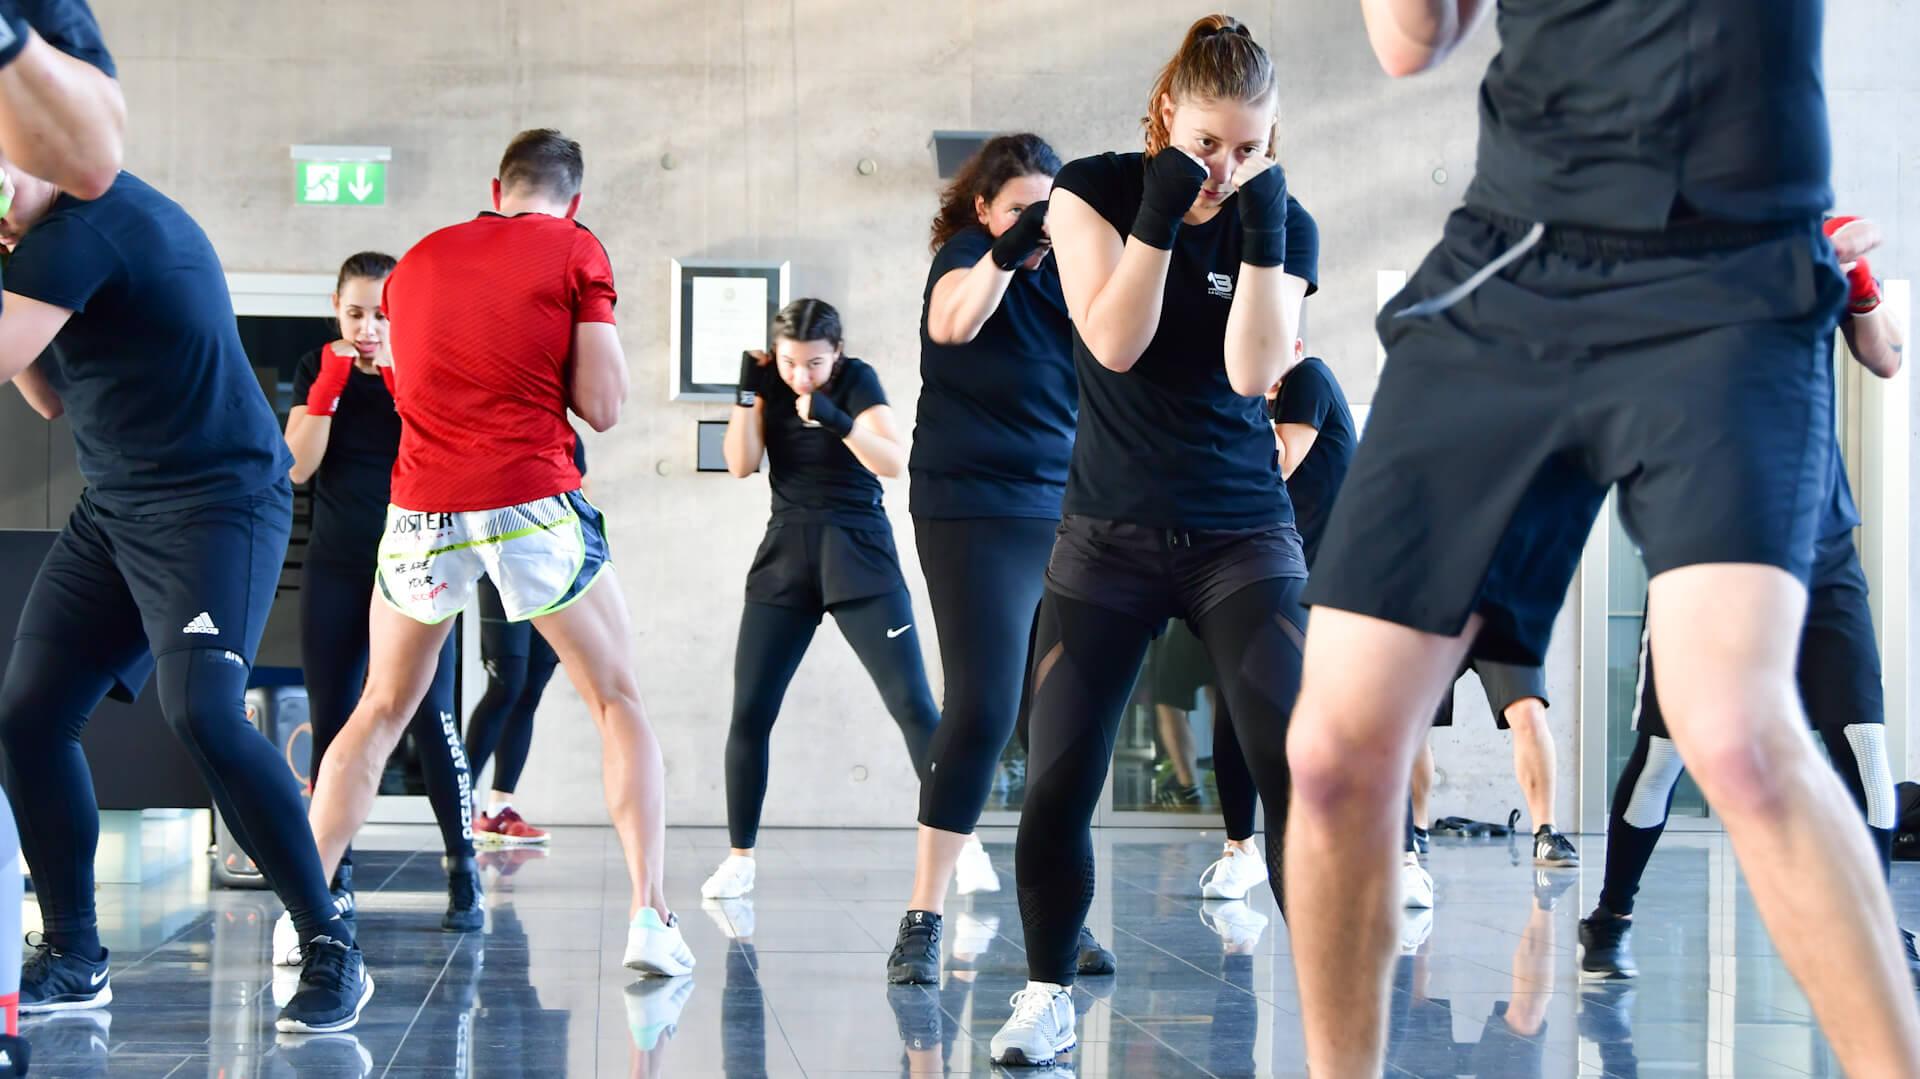 Sportakademie Baumann Kickboxen Basics